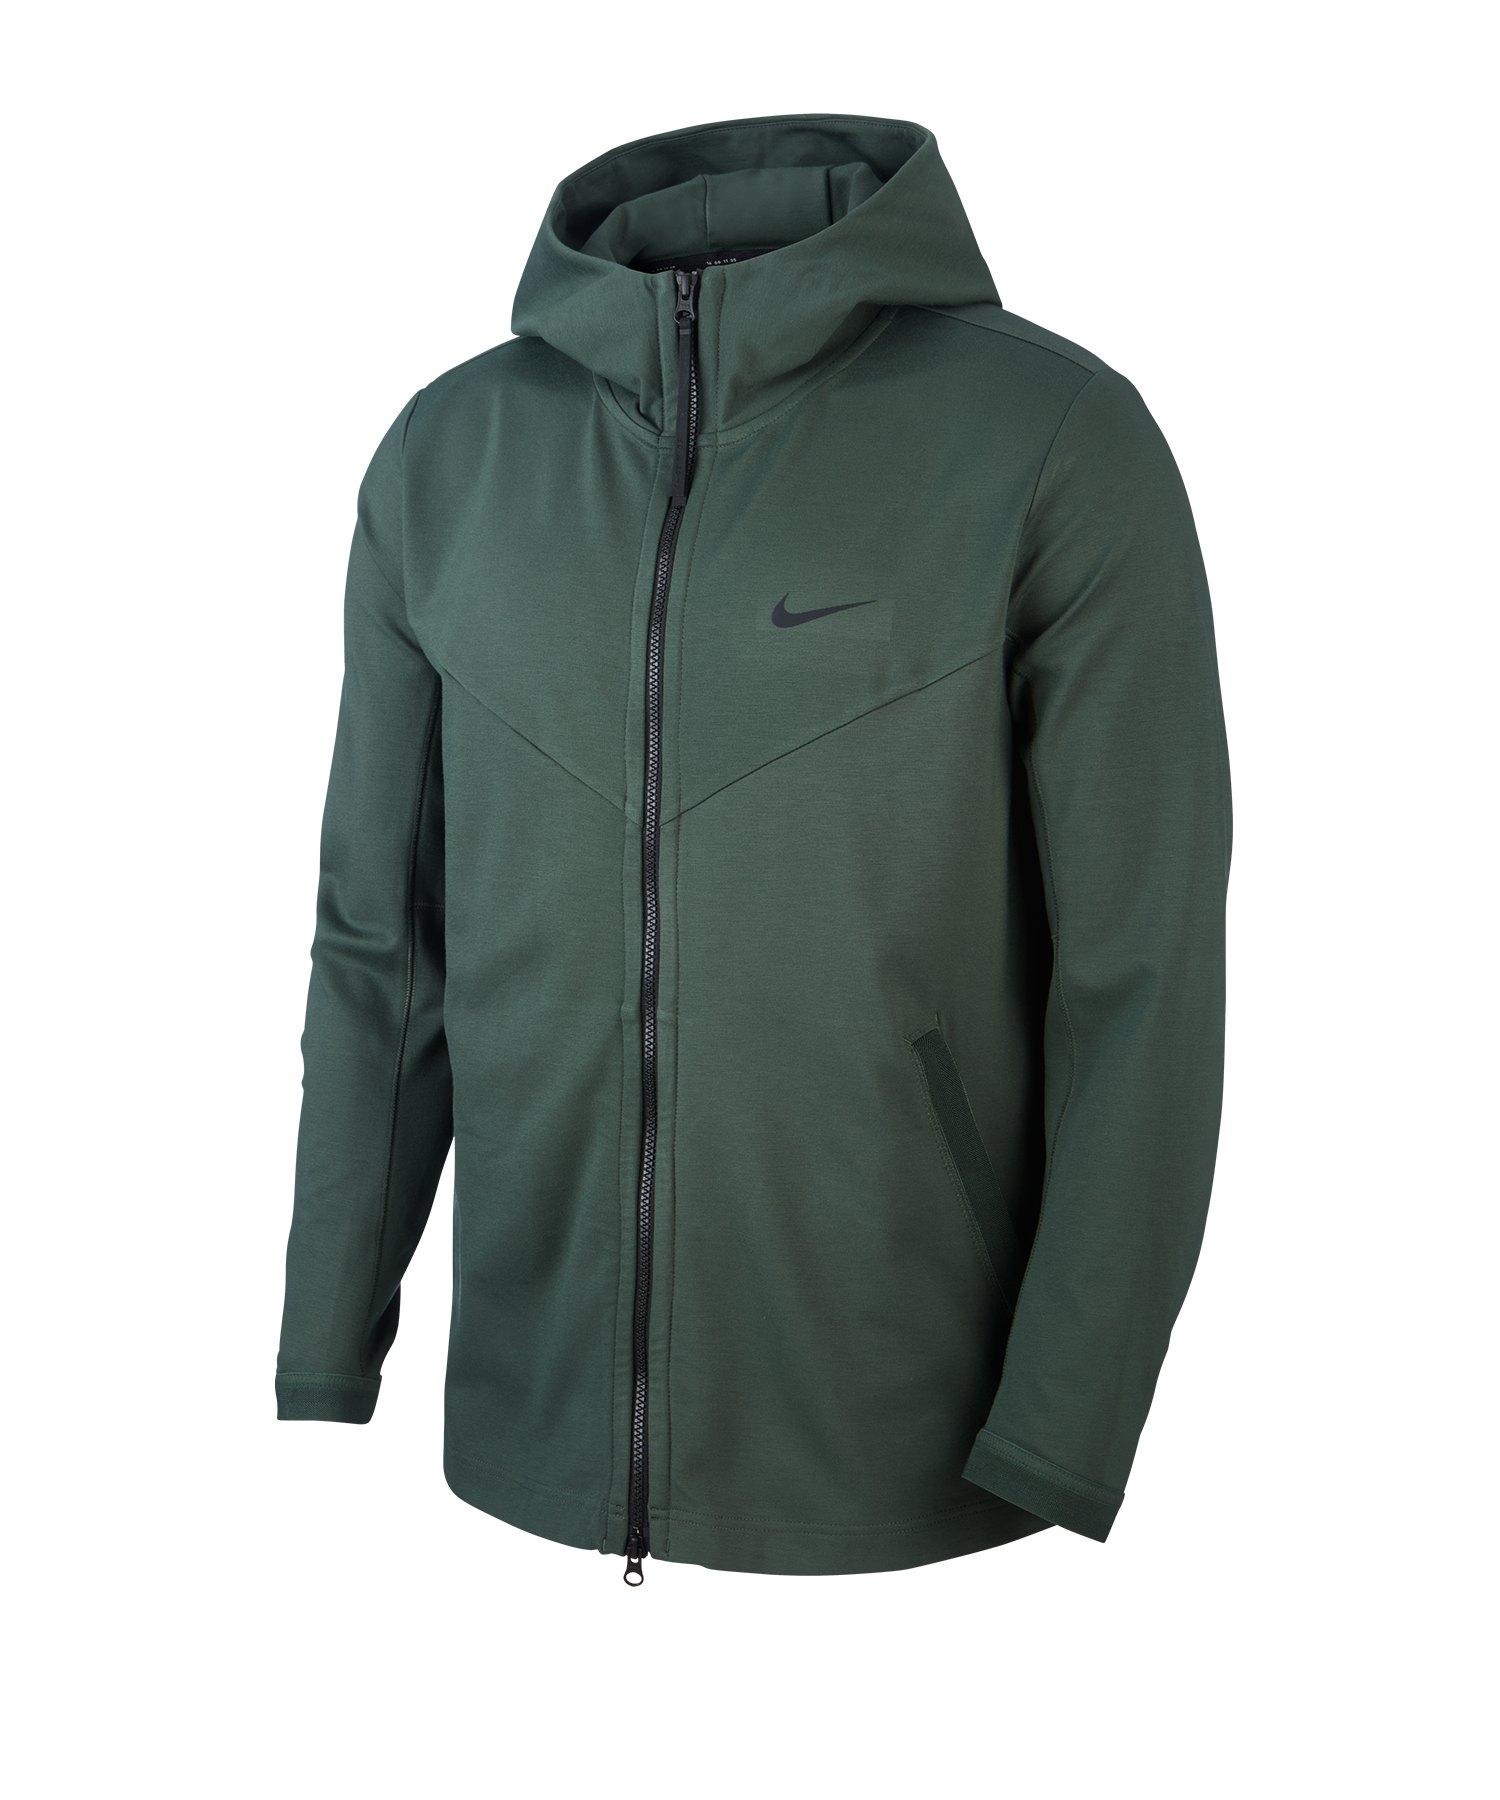 Nike Full-Zip Hooded Jacke Grün F370 - gruen